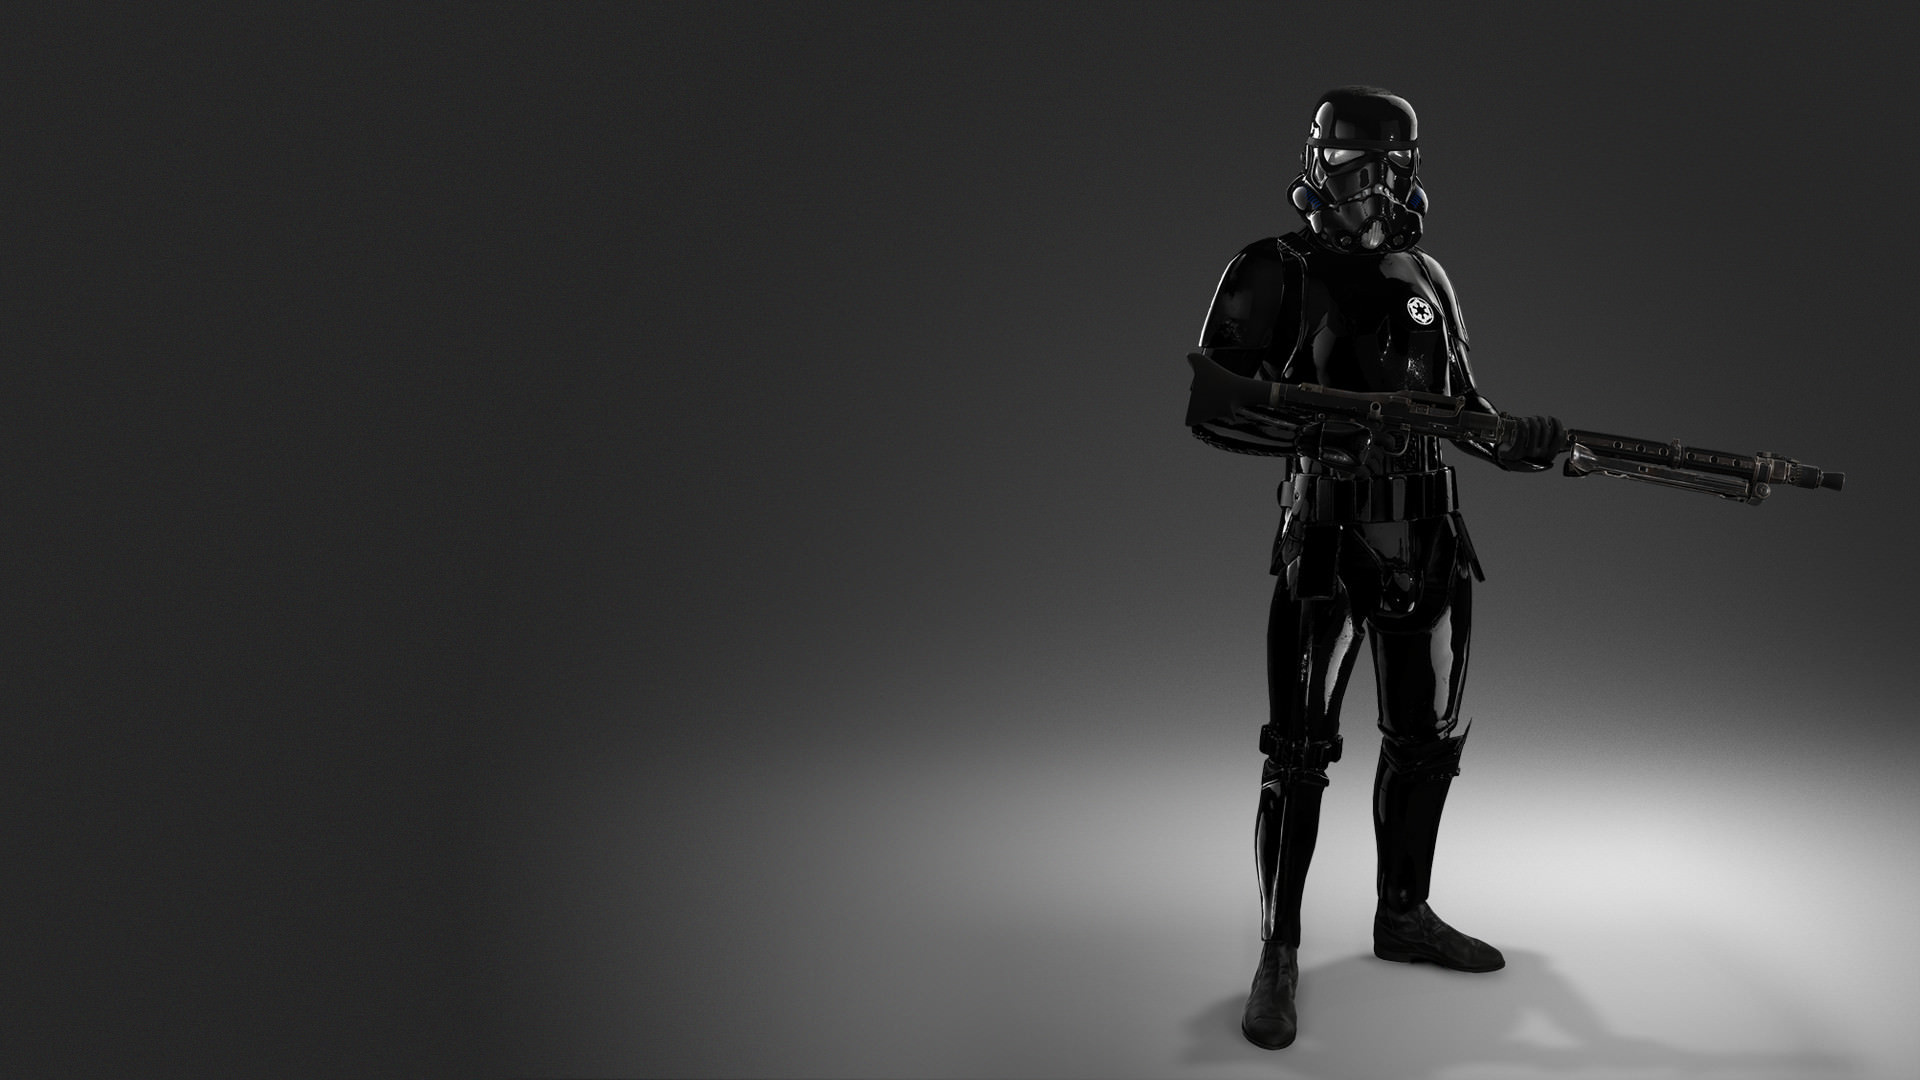 Shadow Trooper confirmed as appearance option! : StarWarsBattlefront